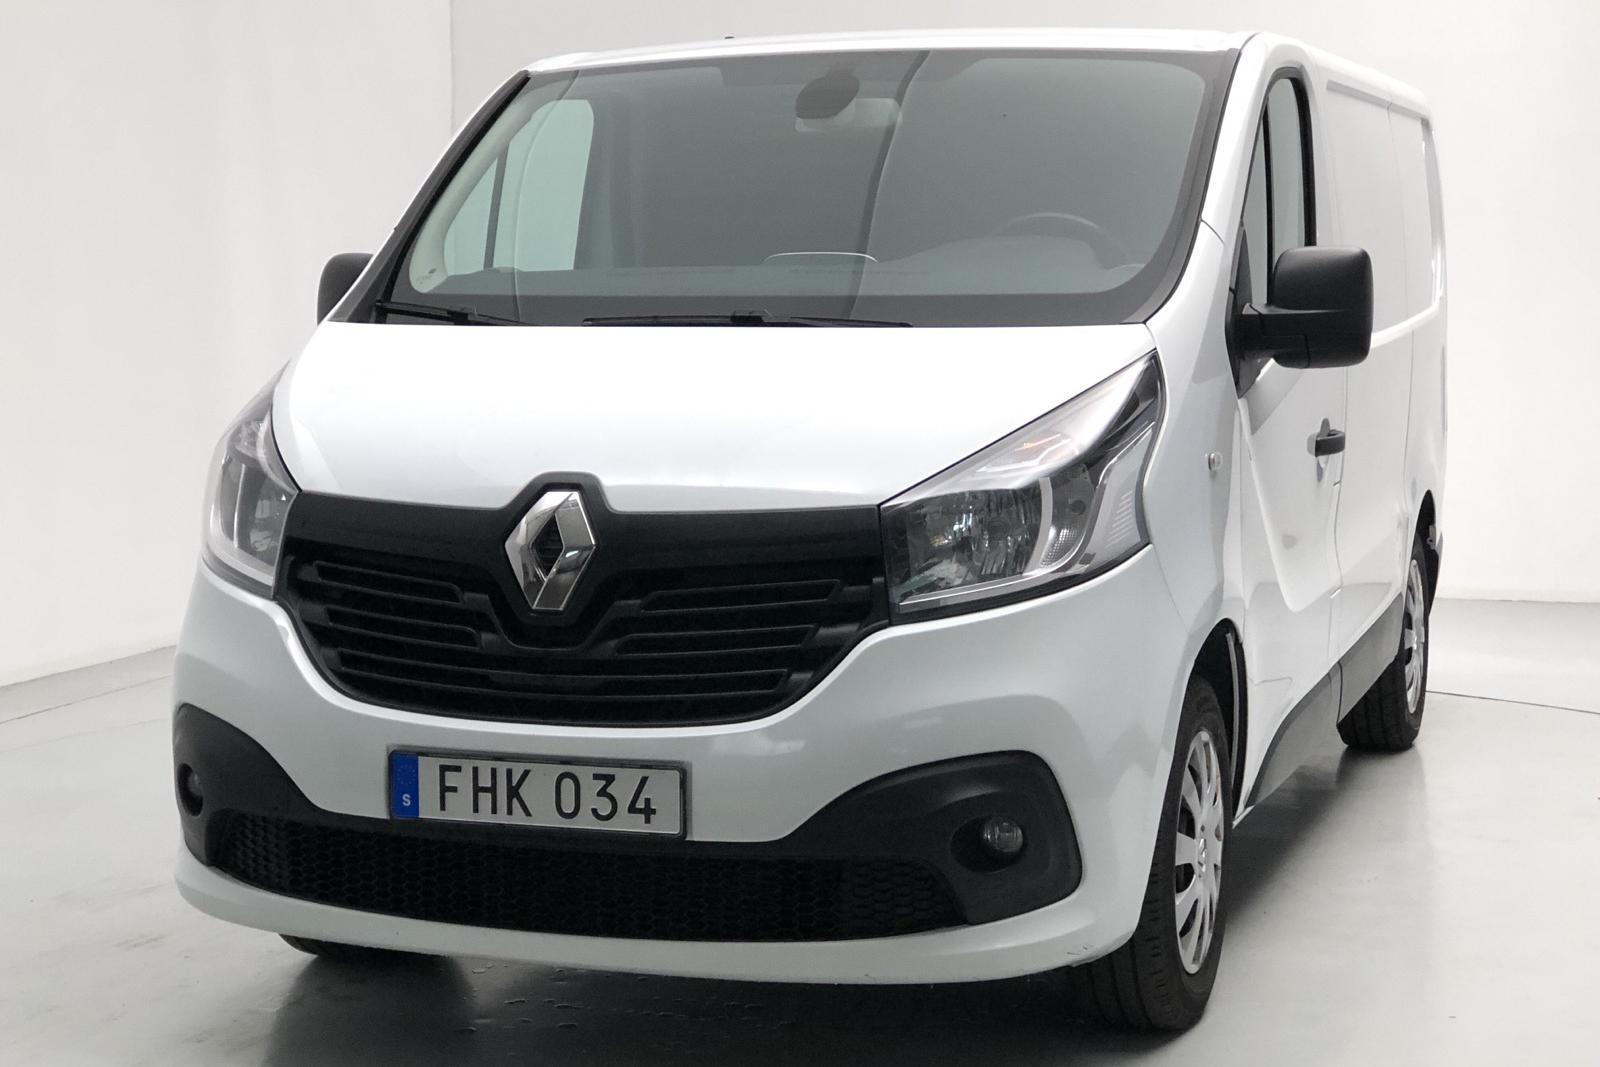 Renault Trafic 1.6 dCi Skåp (115hk) - 0 mil - Manuell - vit - 2016